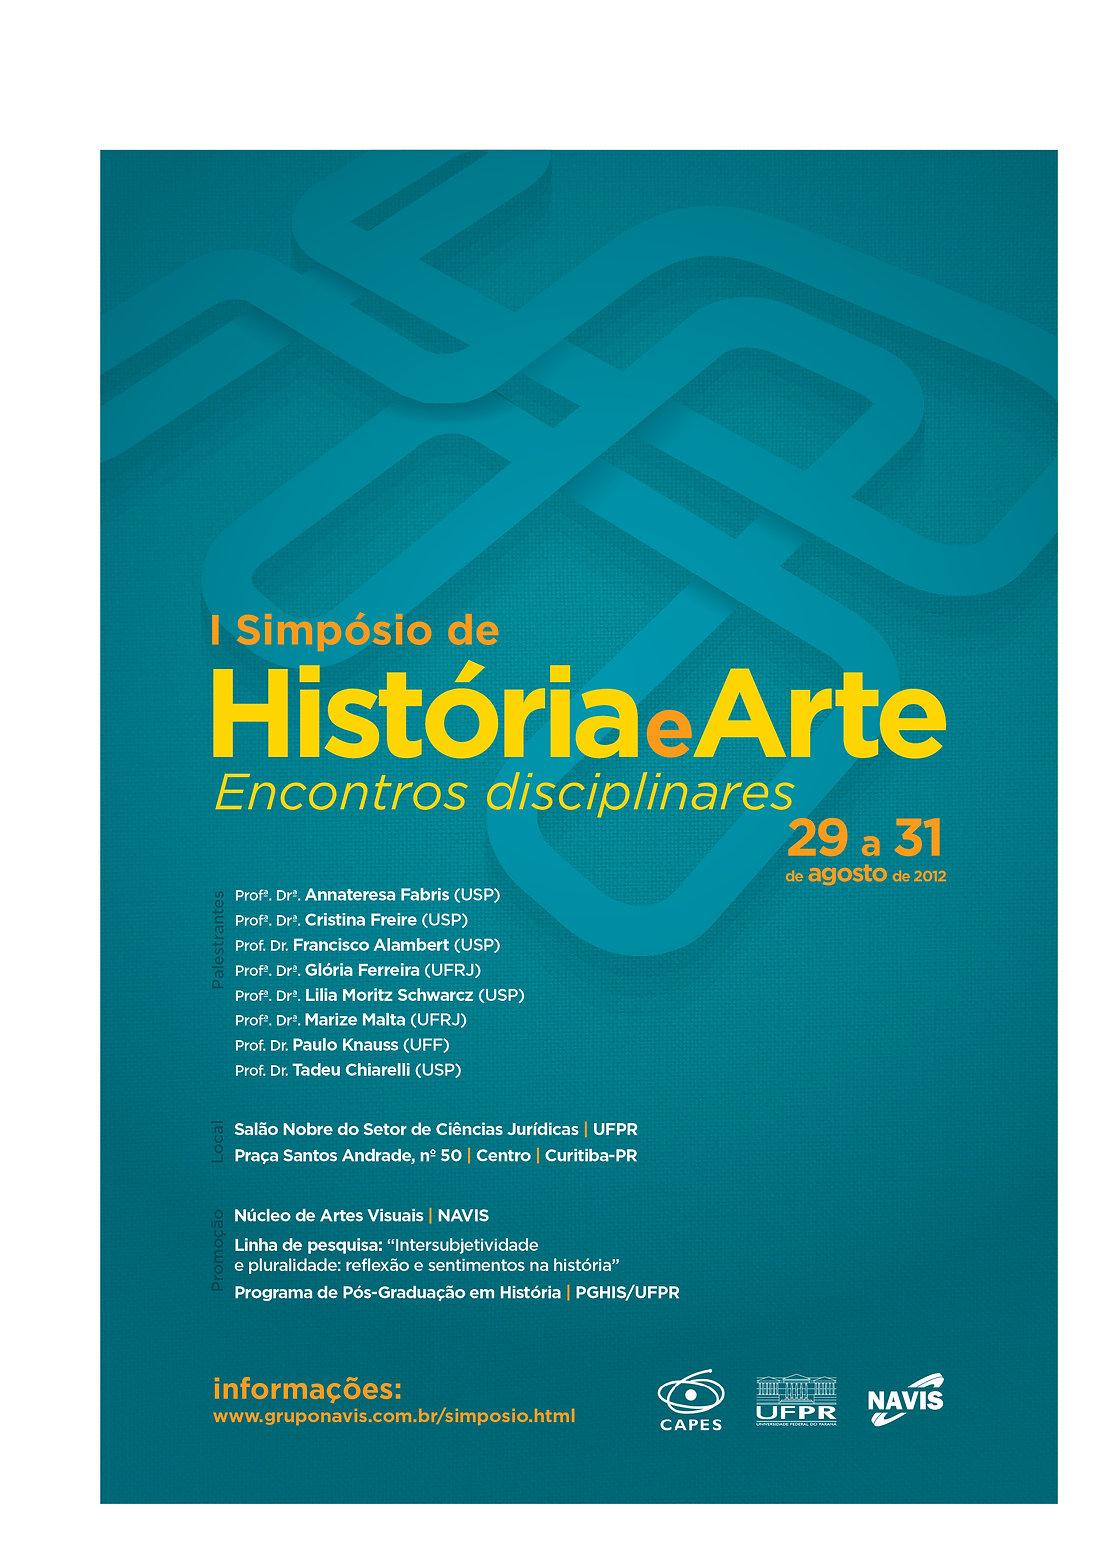 cartaz_simposio_historia_arte-03.jpg